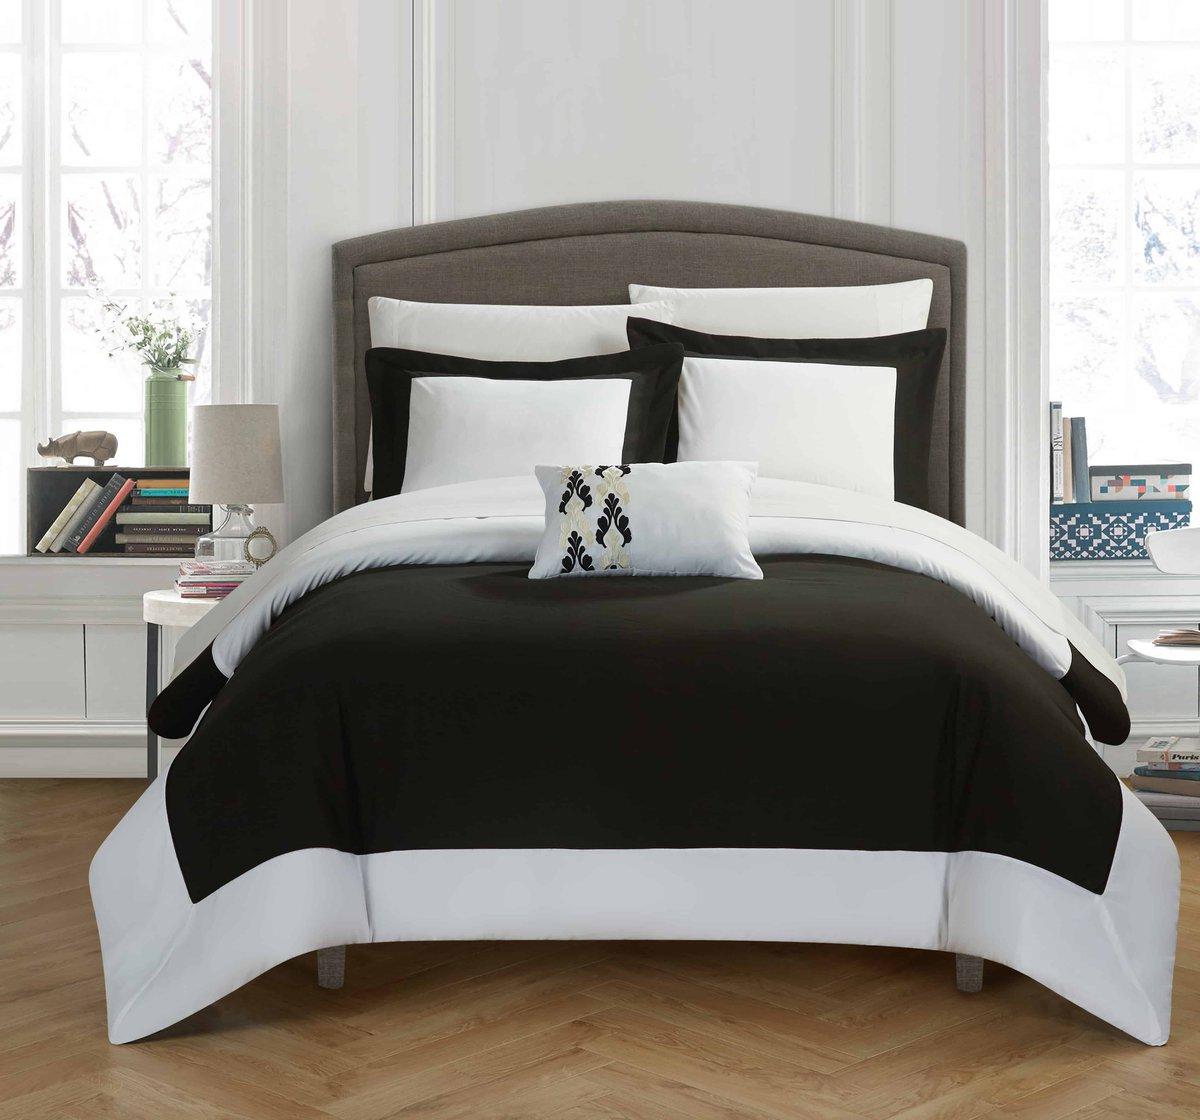 Update your bedroom with a simple reversible 2 tone color block design.•••••#wynncomforter #sale #fall #ตามหา #autumn #ขาย #shop #sbn #lyn #siambrandname #lynaround #kloset #อยากขาย #topshop #ตามหาจนเจอ #areeya #milin #kayasis #2hand #скидки #disaya #weloveshopping